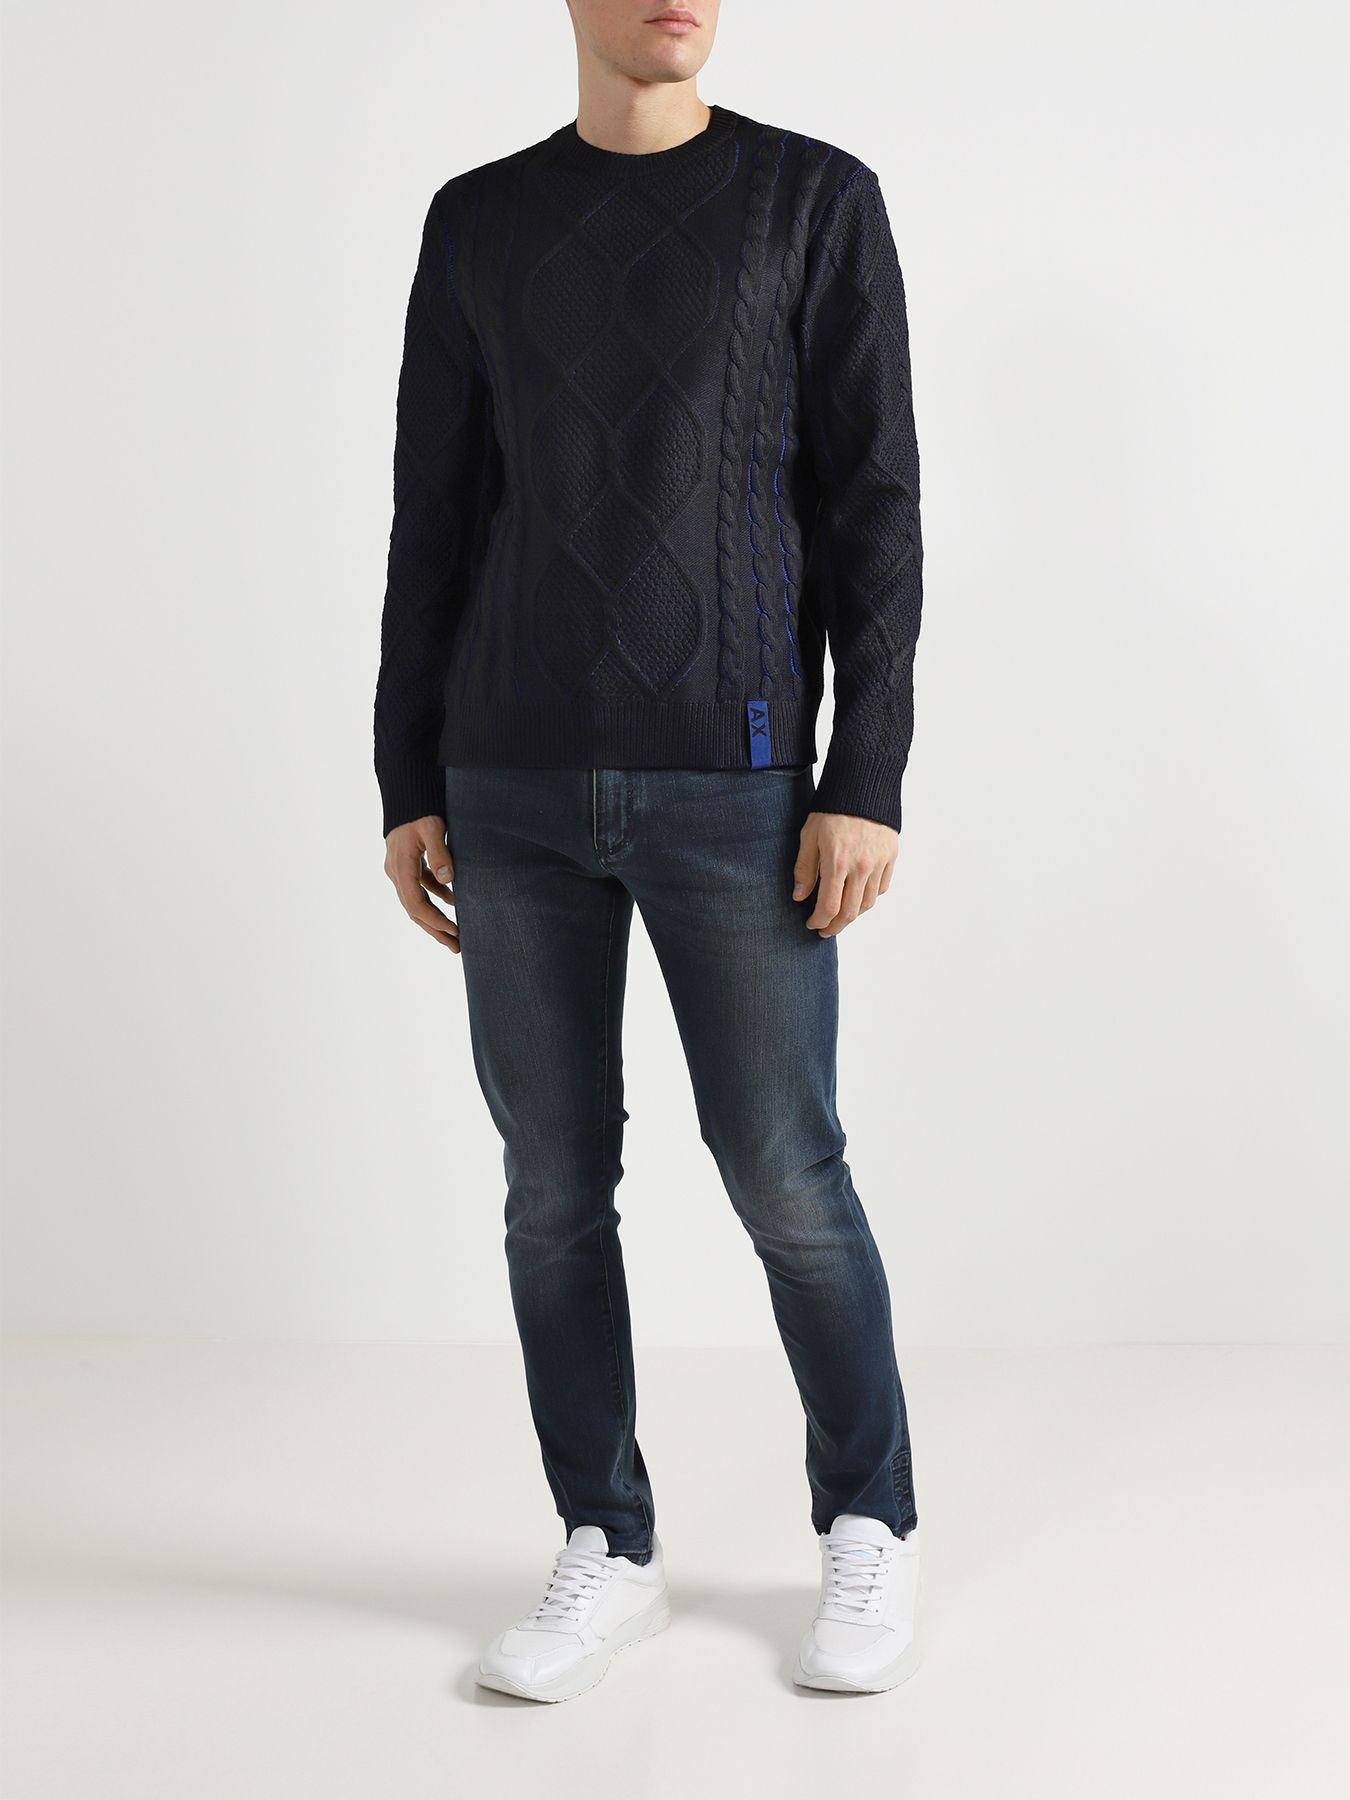 Джемпер Armani Exchange Мужской свитер